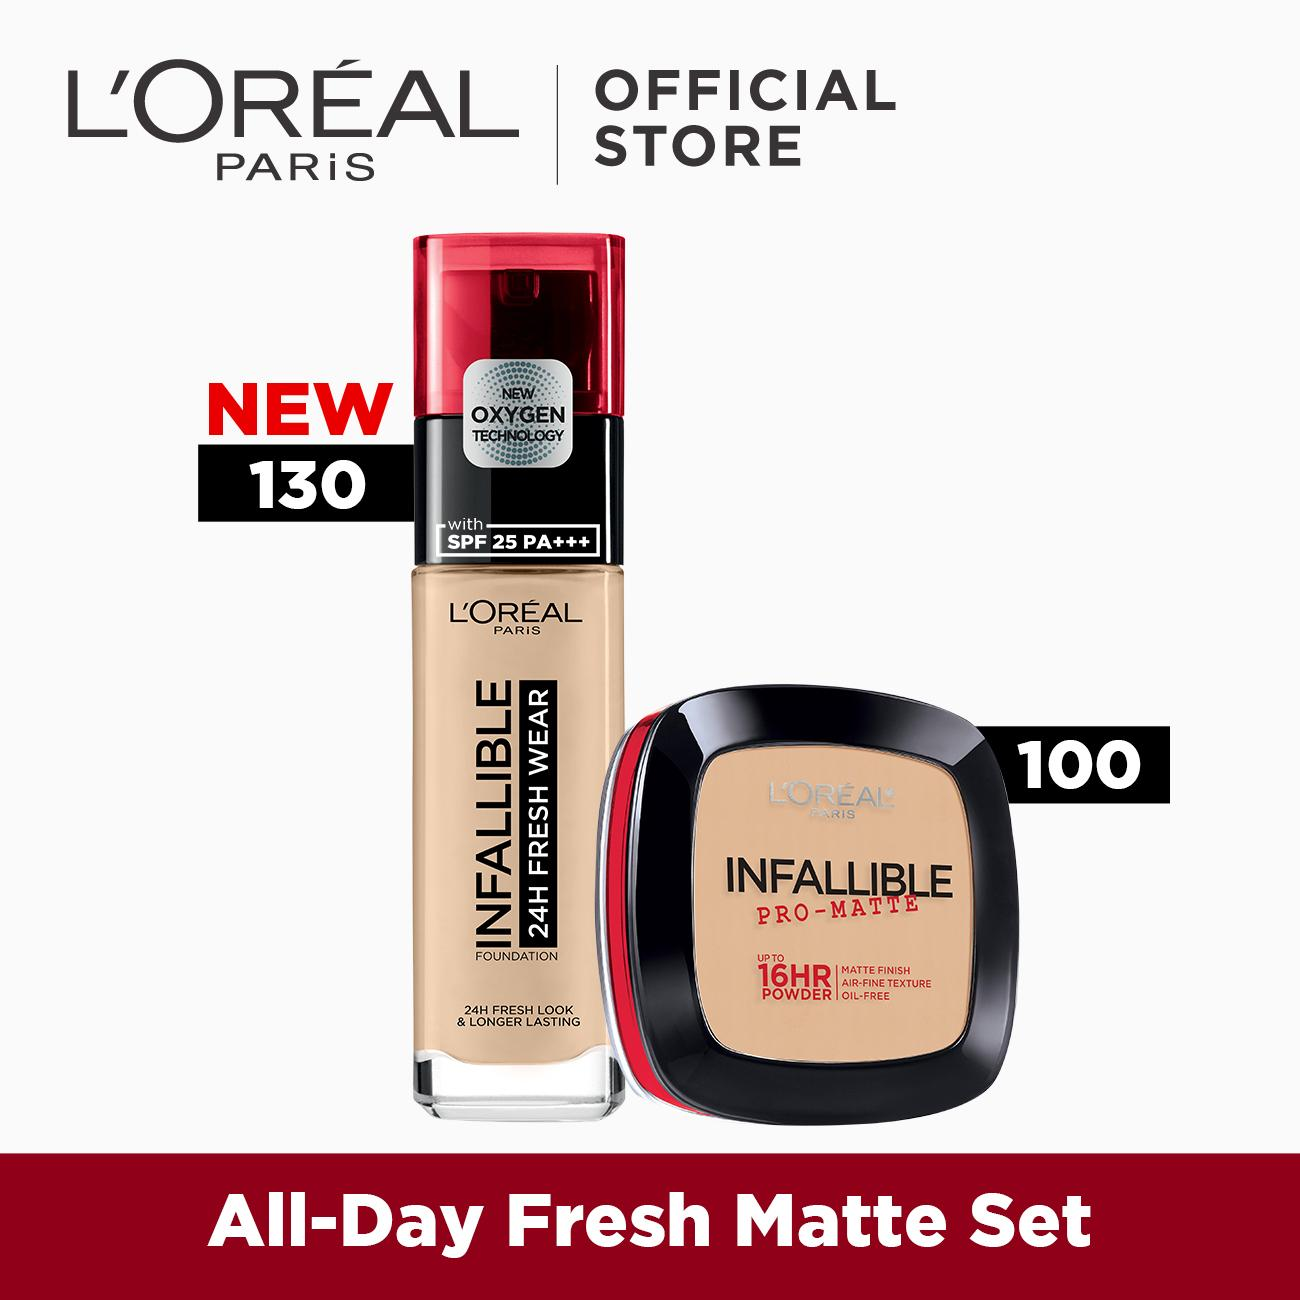 All-Day Fresh Matte Set: Infallible 24HR Fresh Wear Foundation + Infallible Pro-